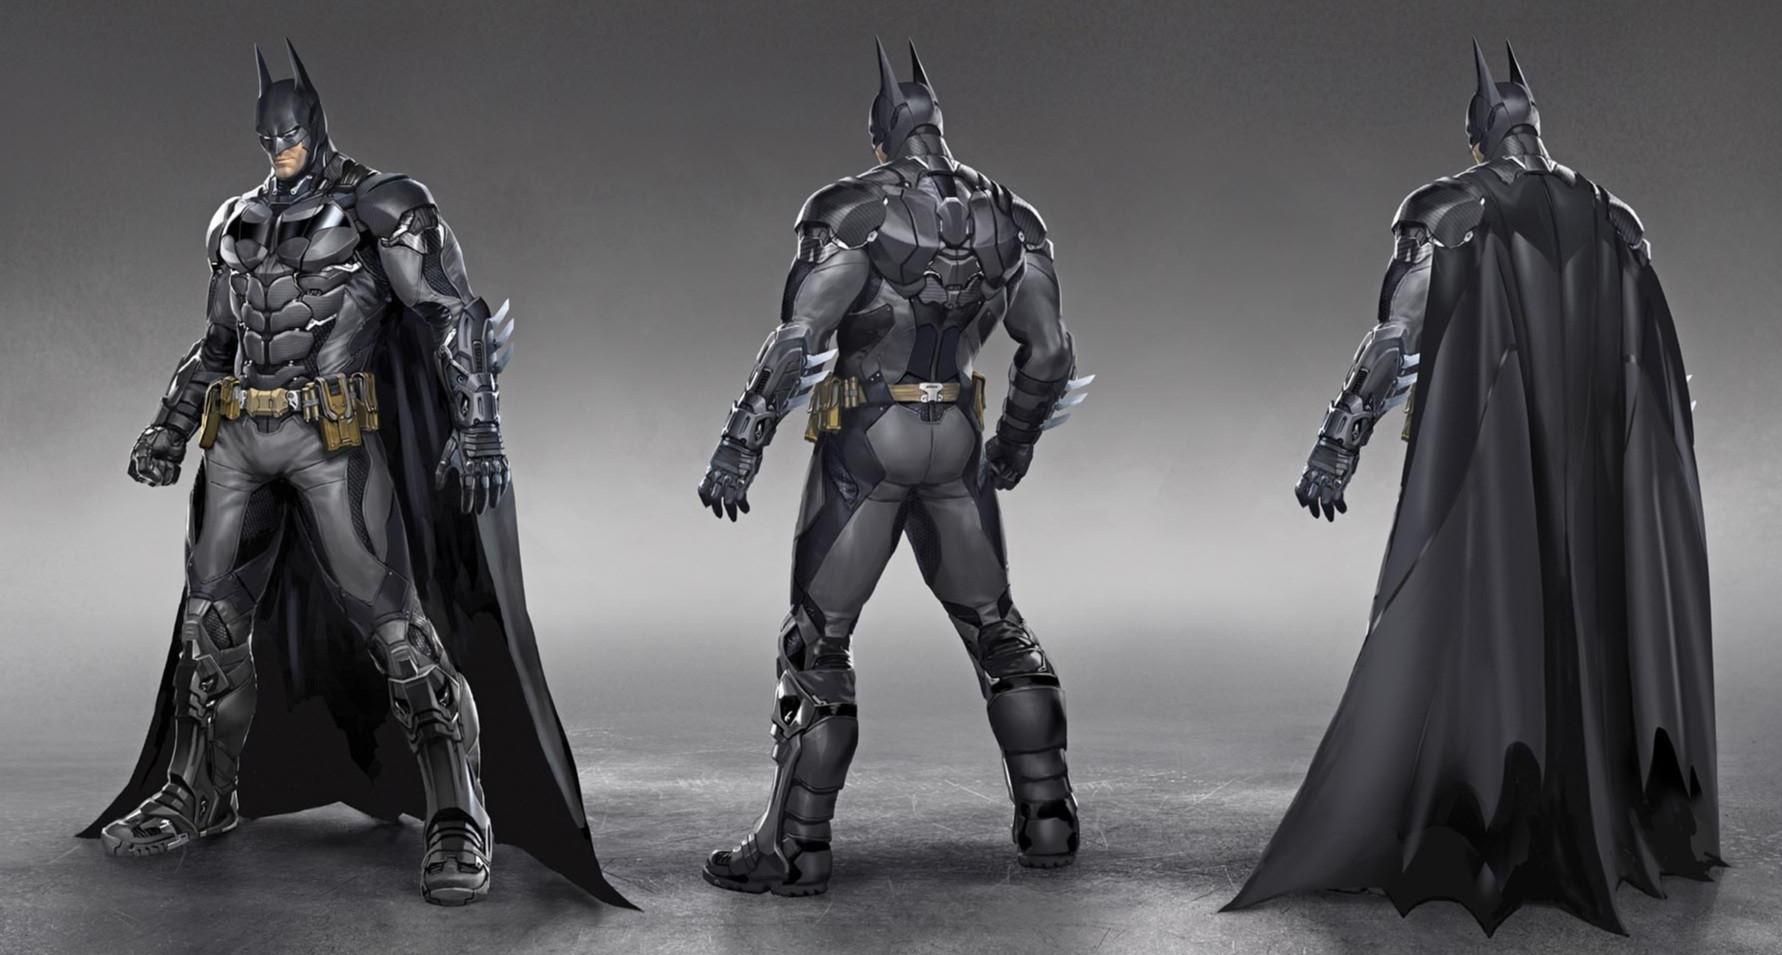 New Batman Arkham Knight Screenshots Show Off Batmobile